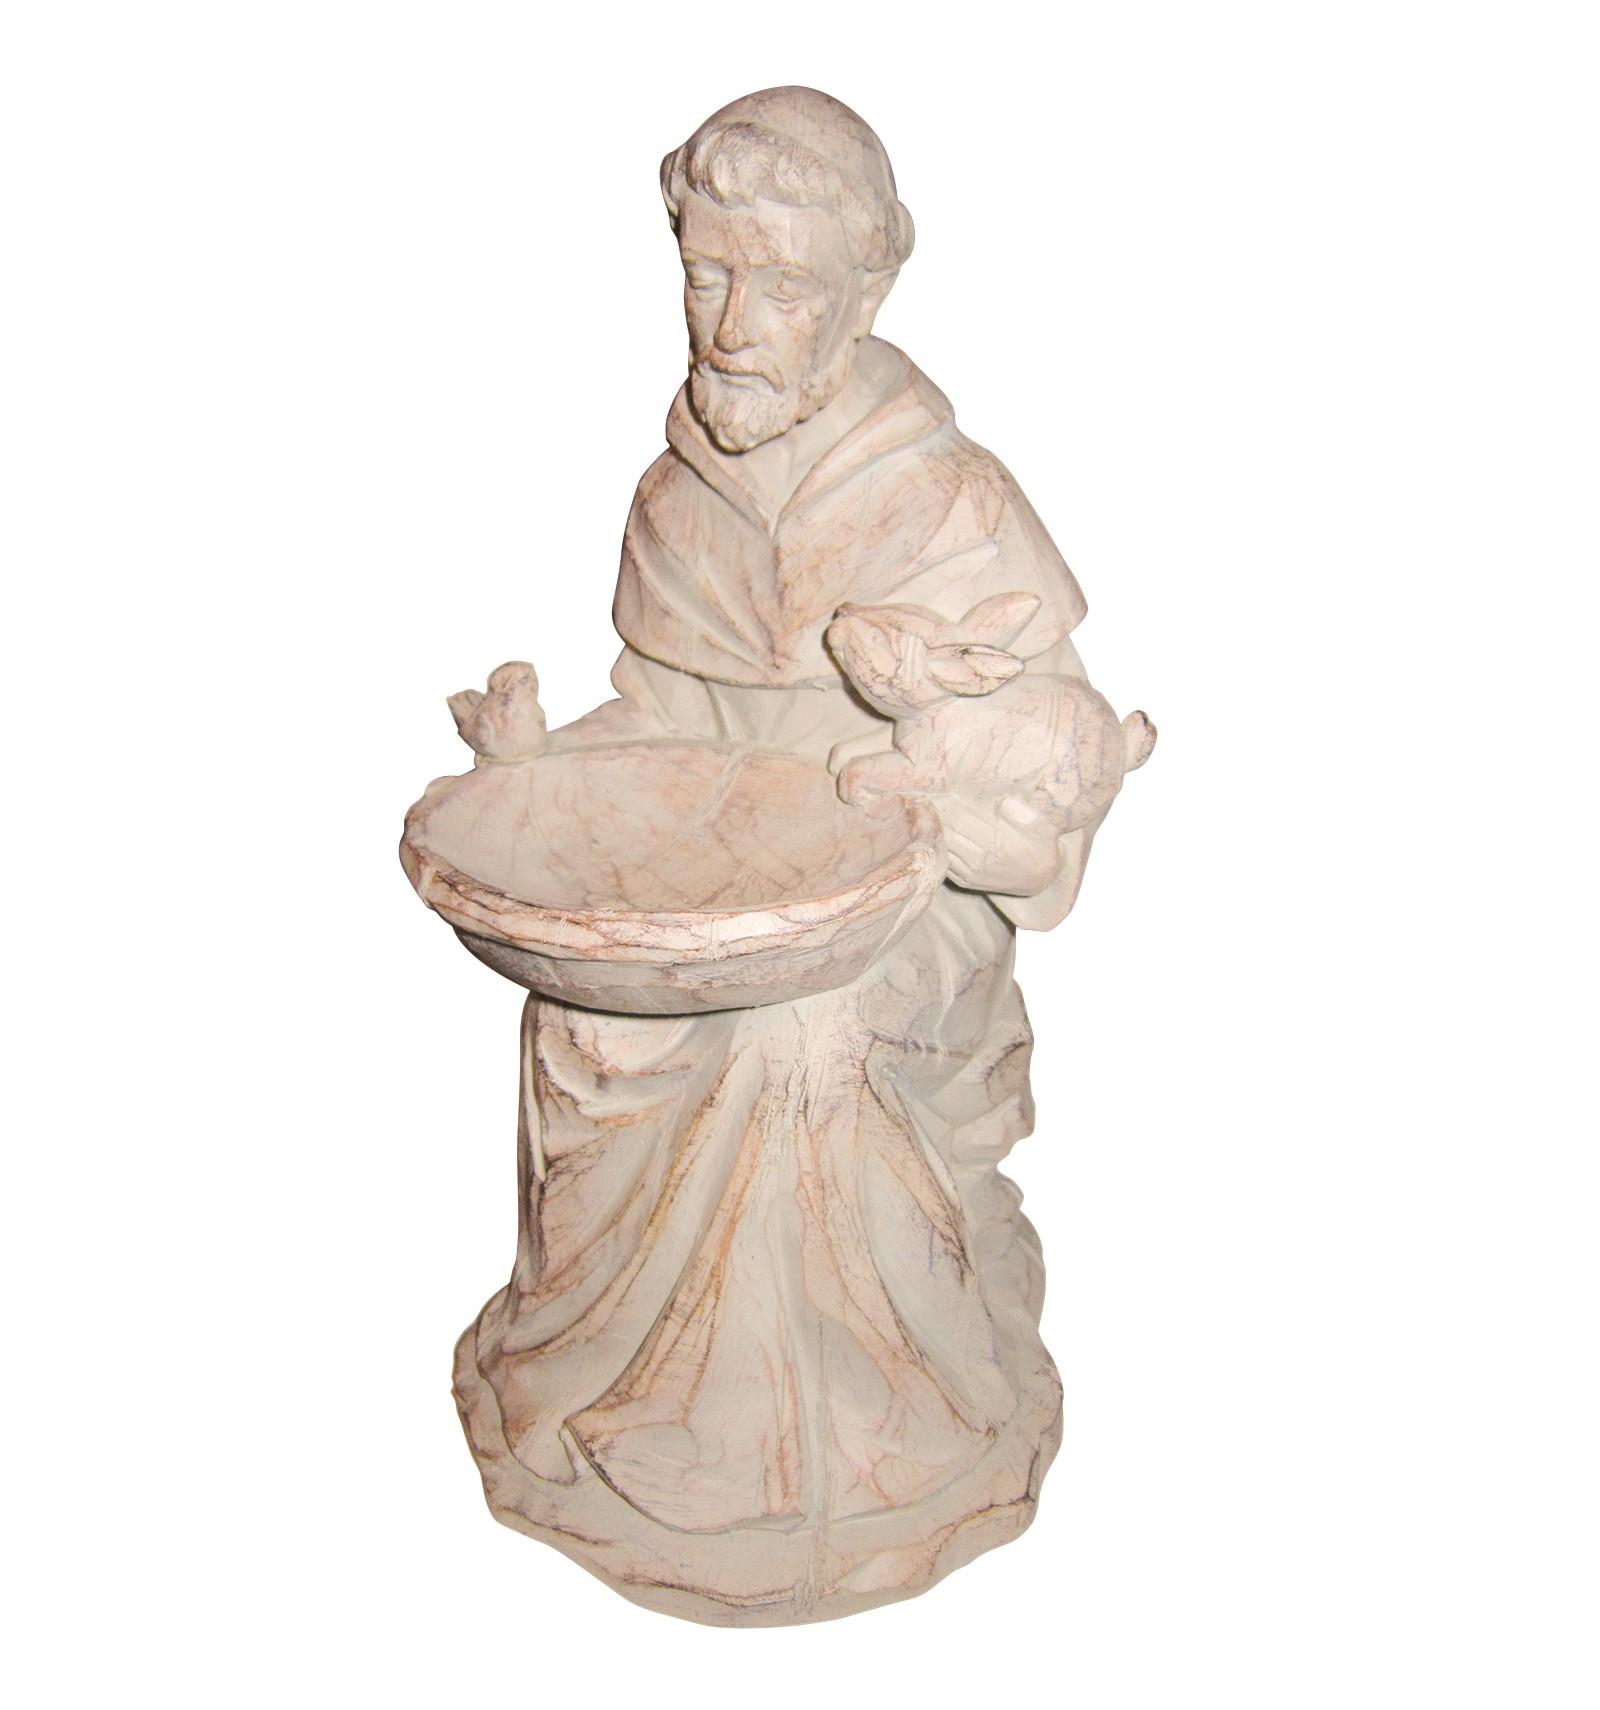 statuette fran 231 ois d assise